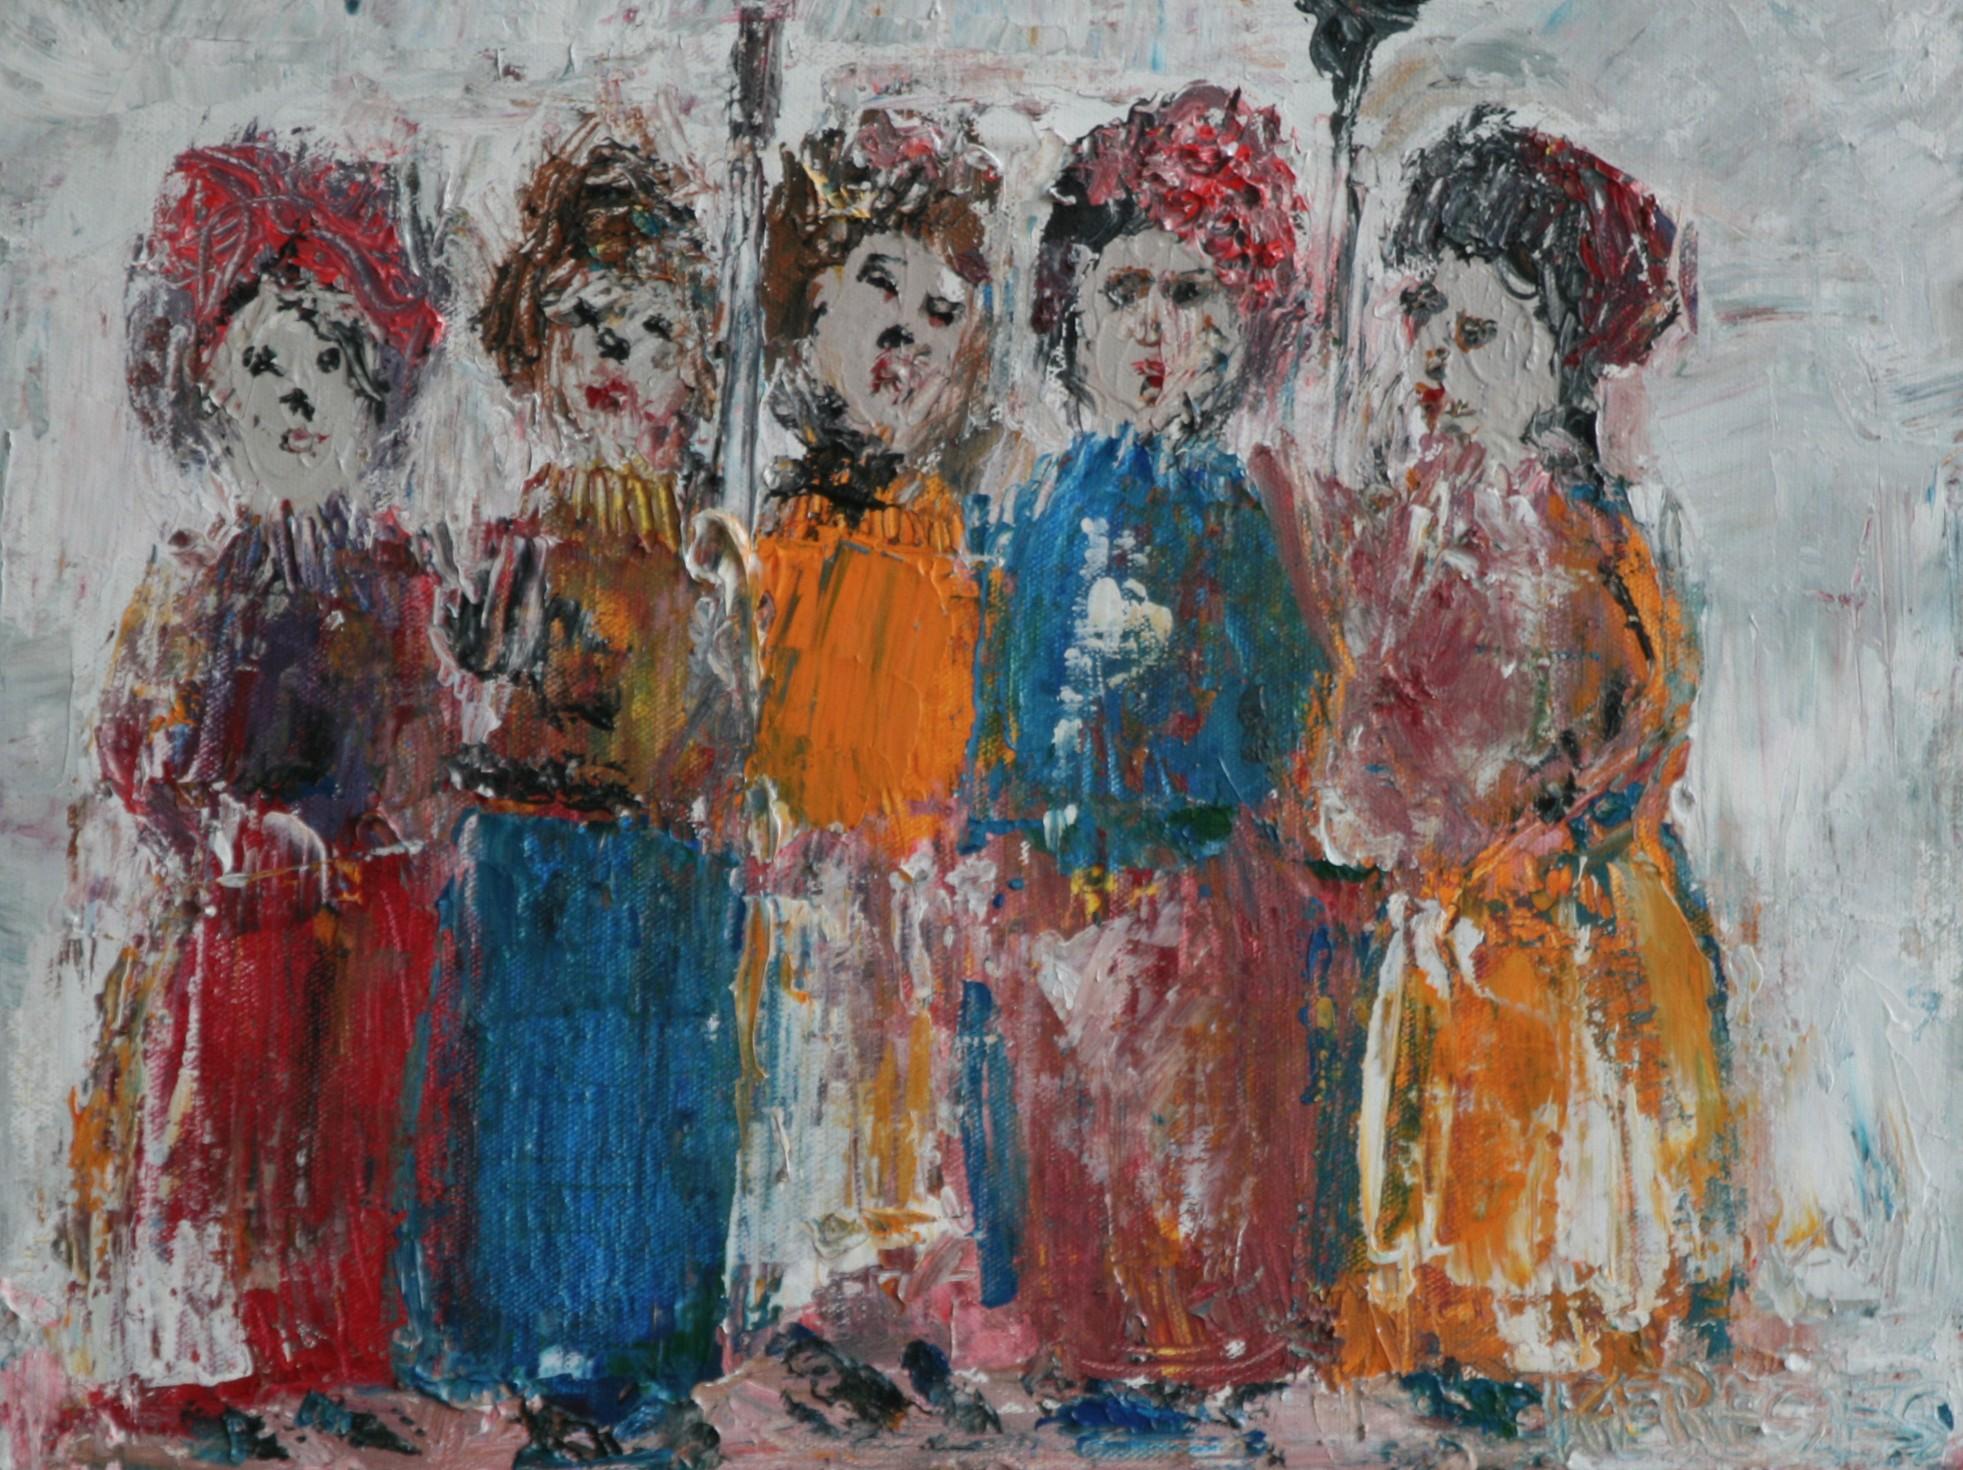 toile 52 - magdalena keresztes, artiste peintre à amiens